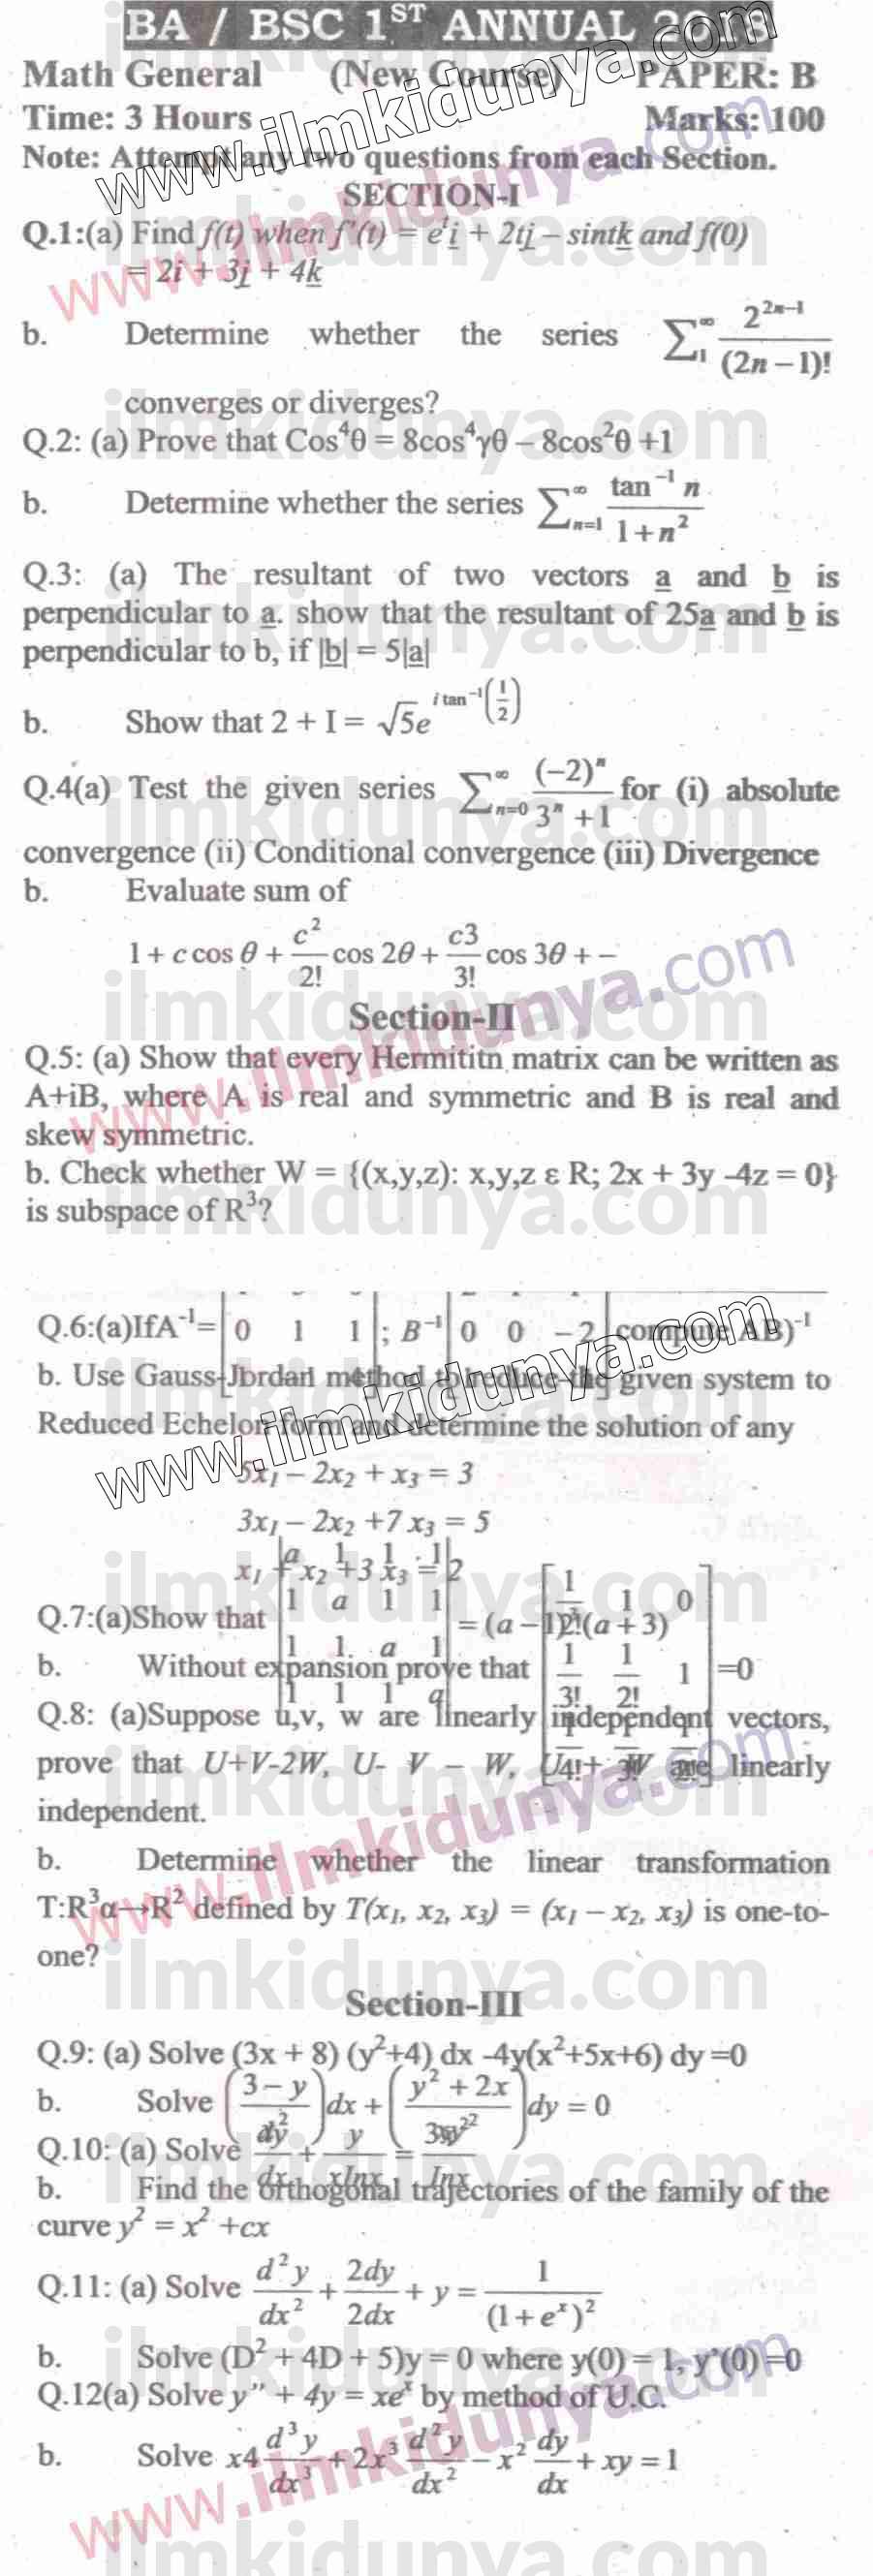 Past Paper 2018 Sargodha University BA BSc Math General Paper B